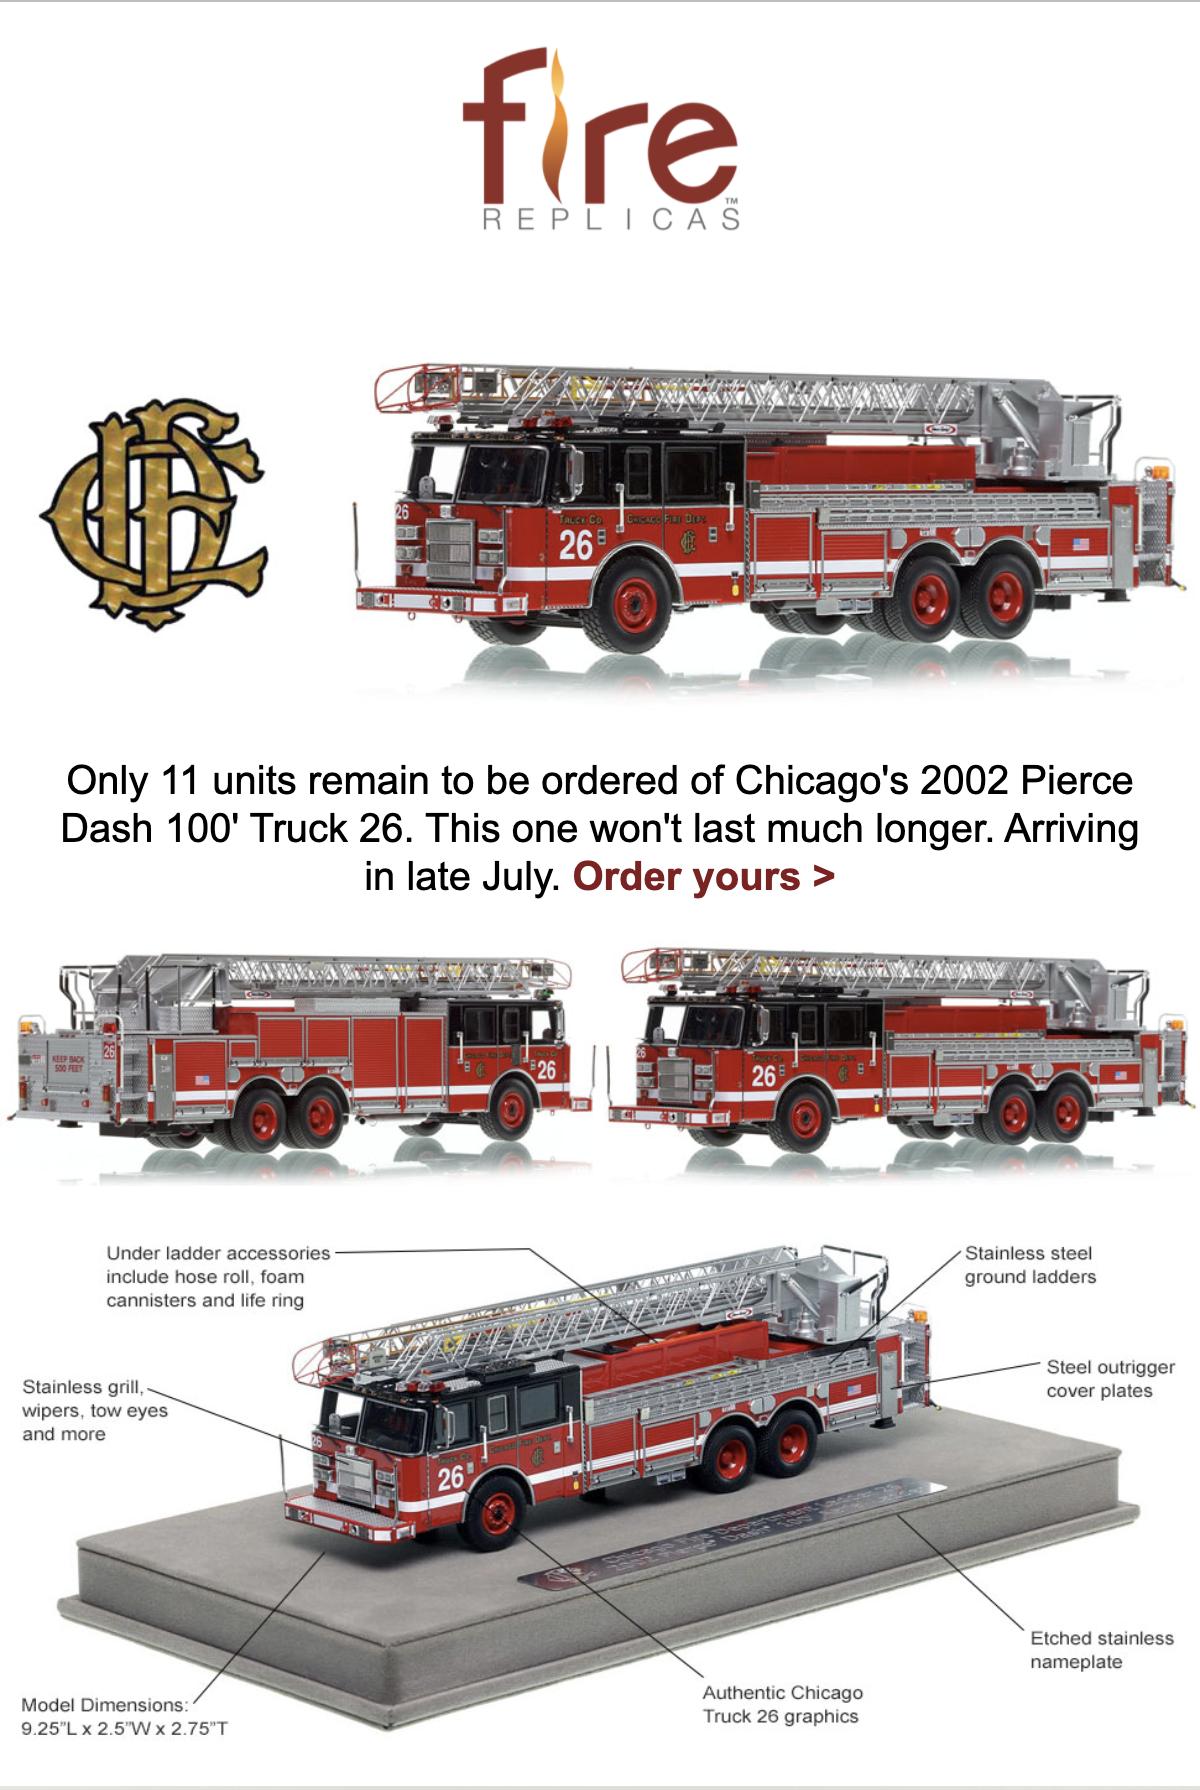 Fire Replicas model of Chicago FD Truck 26 Pierce Dash